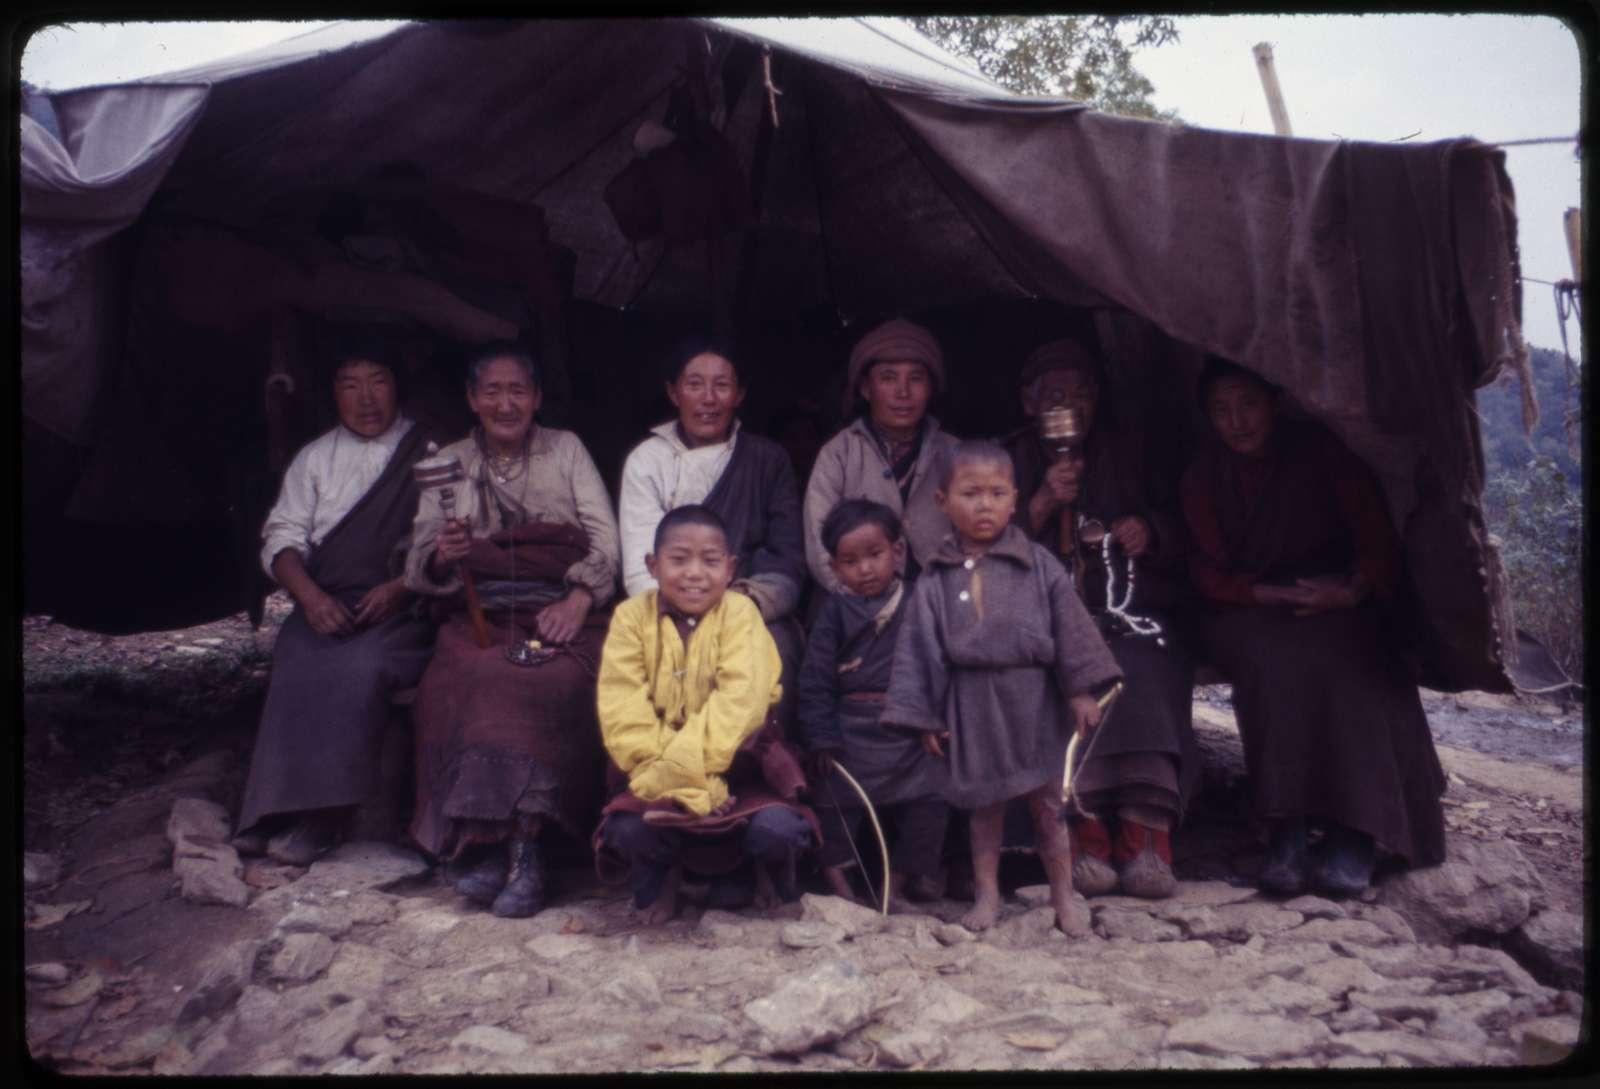 Traveling Tibetan tribe, grandmothers spinning prayer wheels